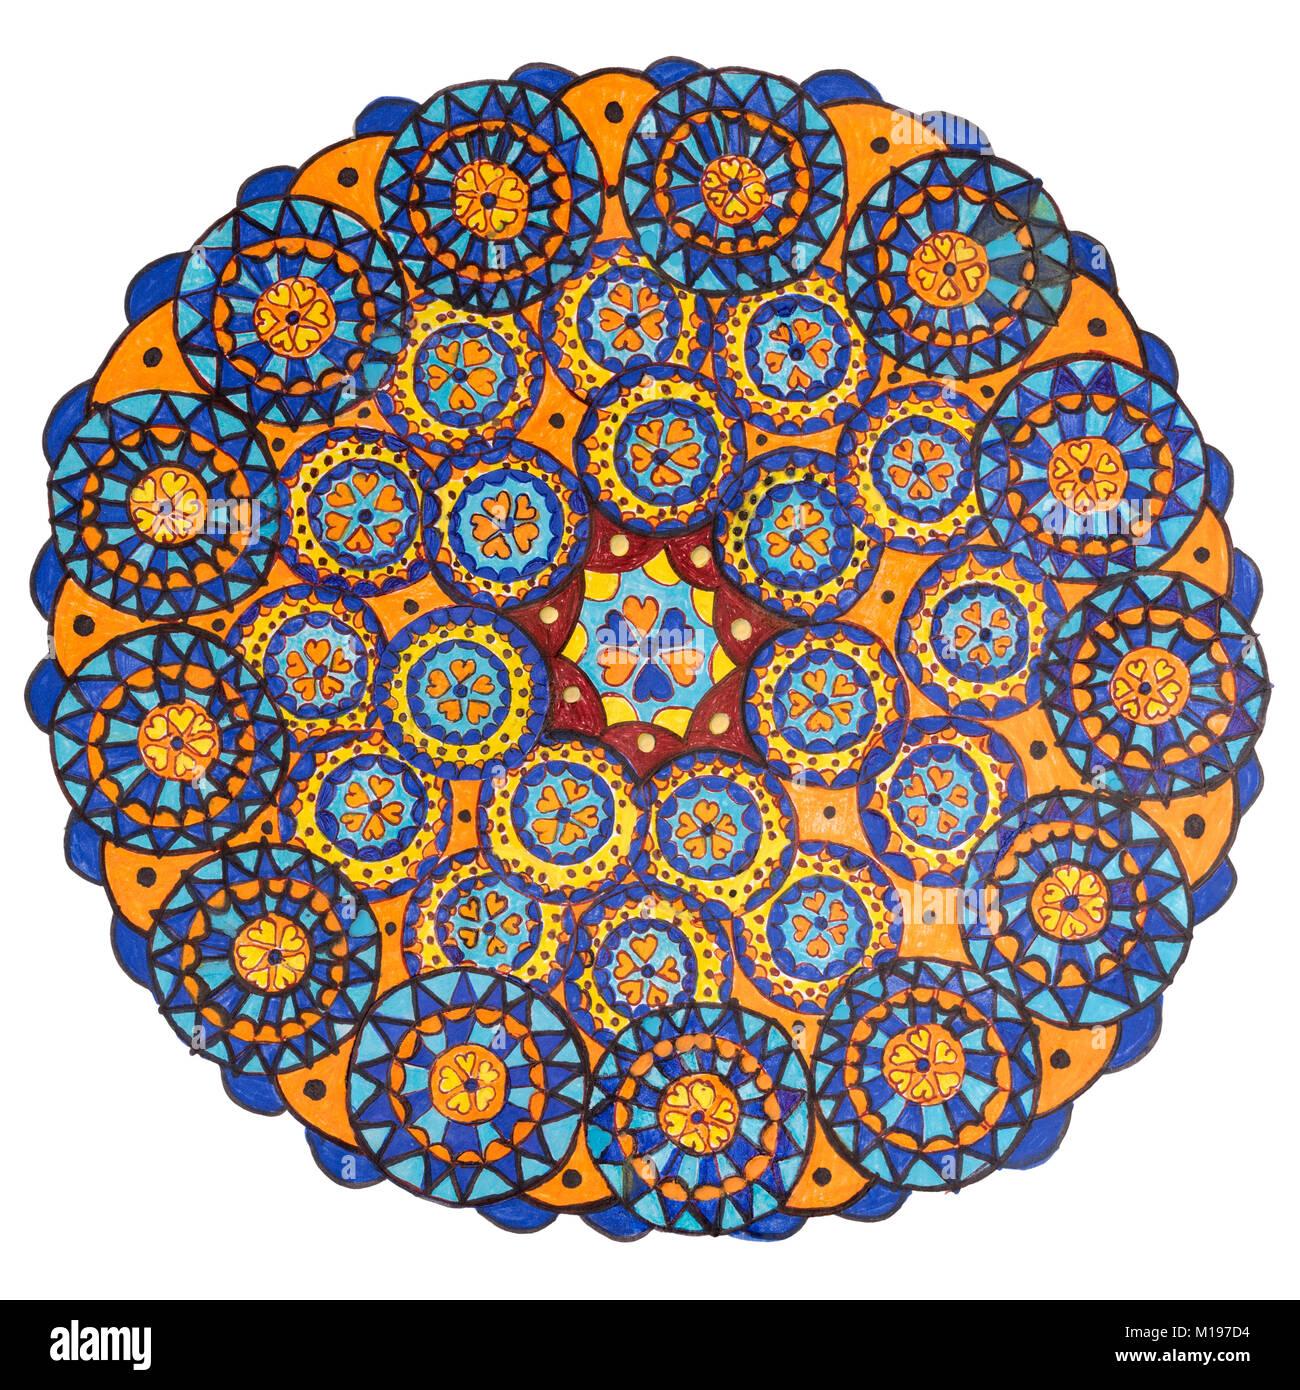 Colorful oriental decorative hand drawn mandala pattern - Stock Image